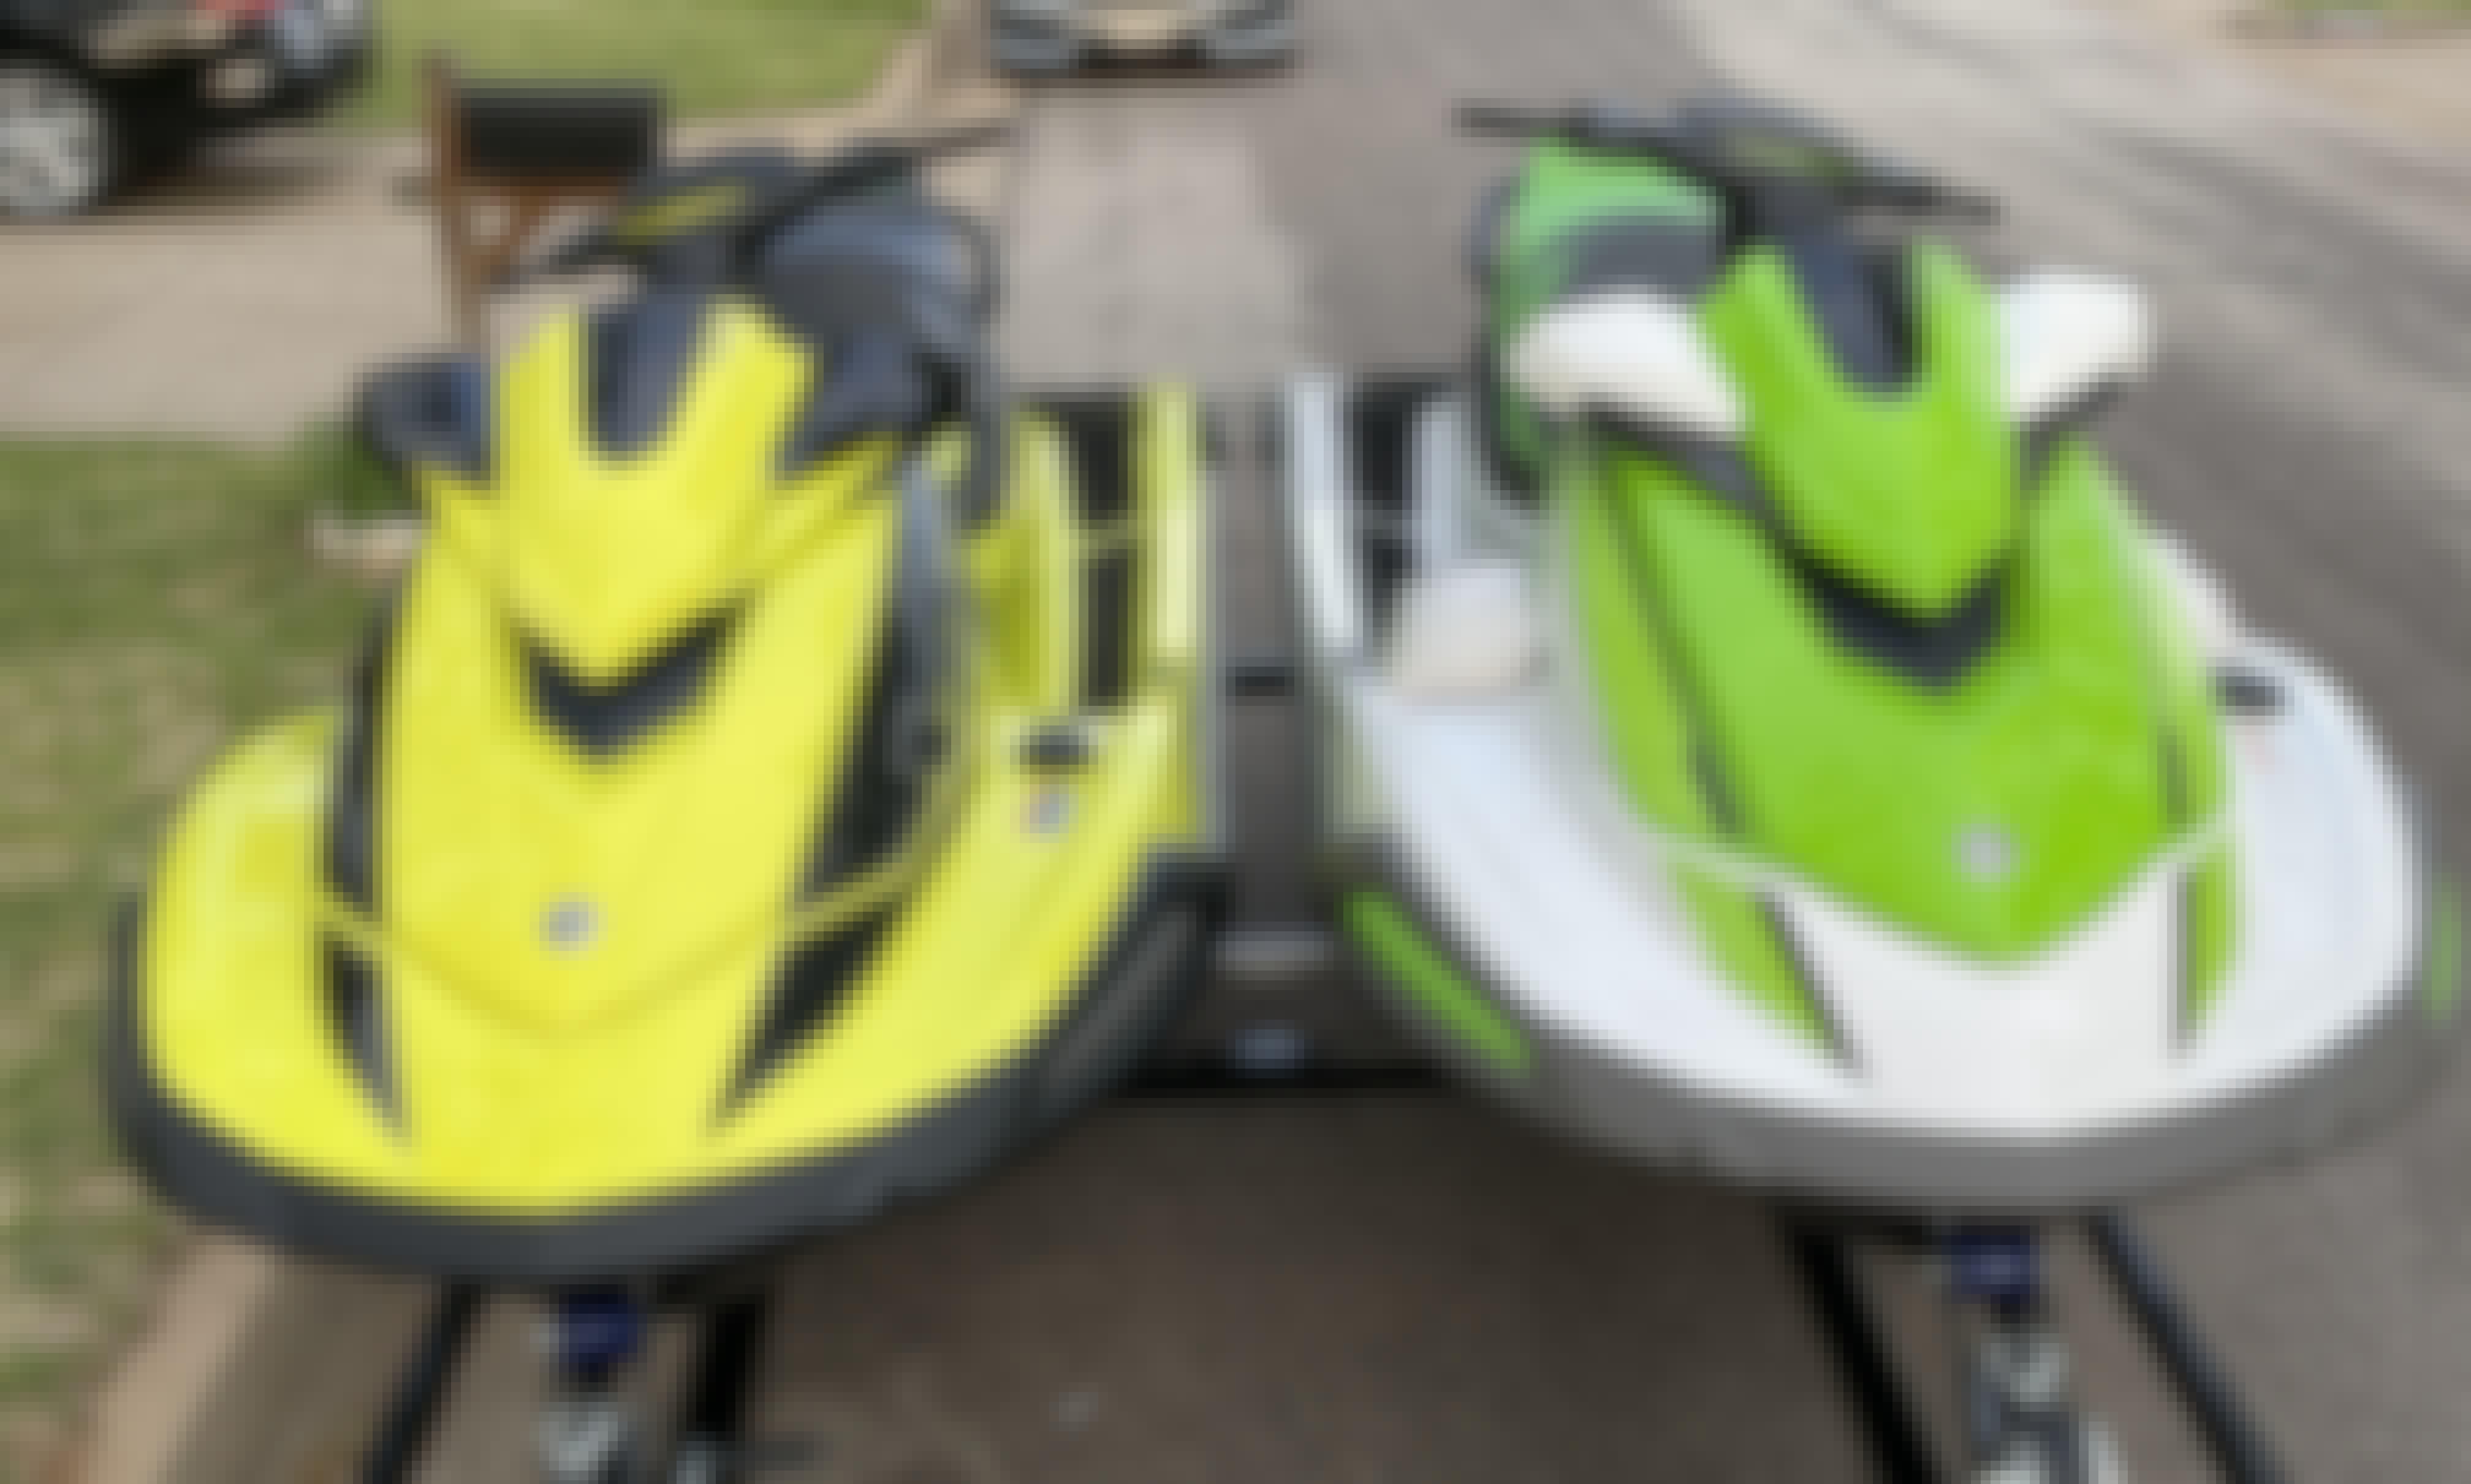 2021 Yamaha Waverunner Jet Skis For Rent x 2 | Lake Texoma